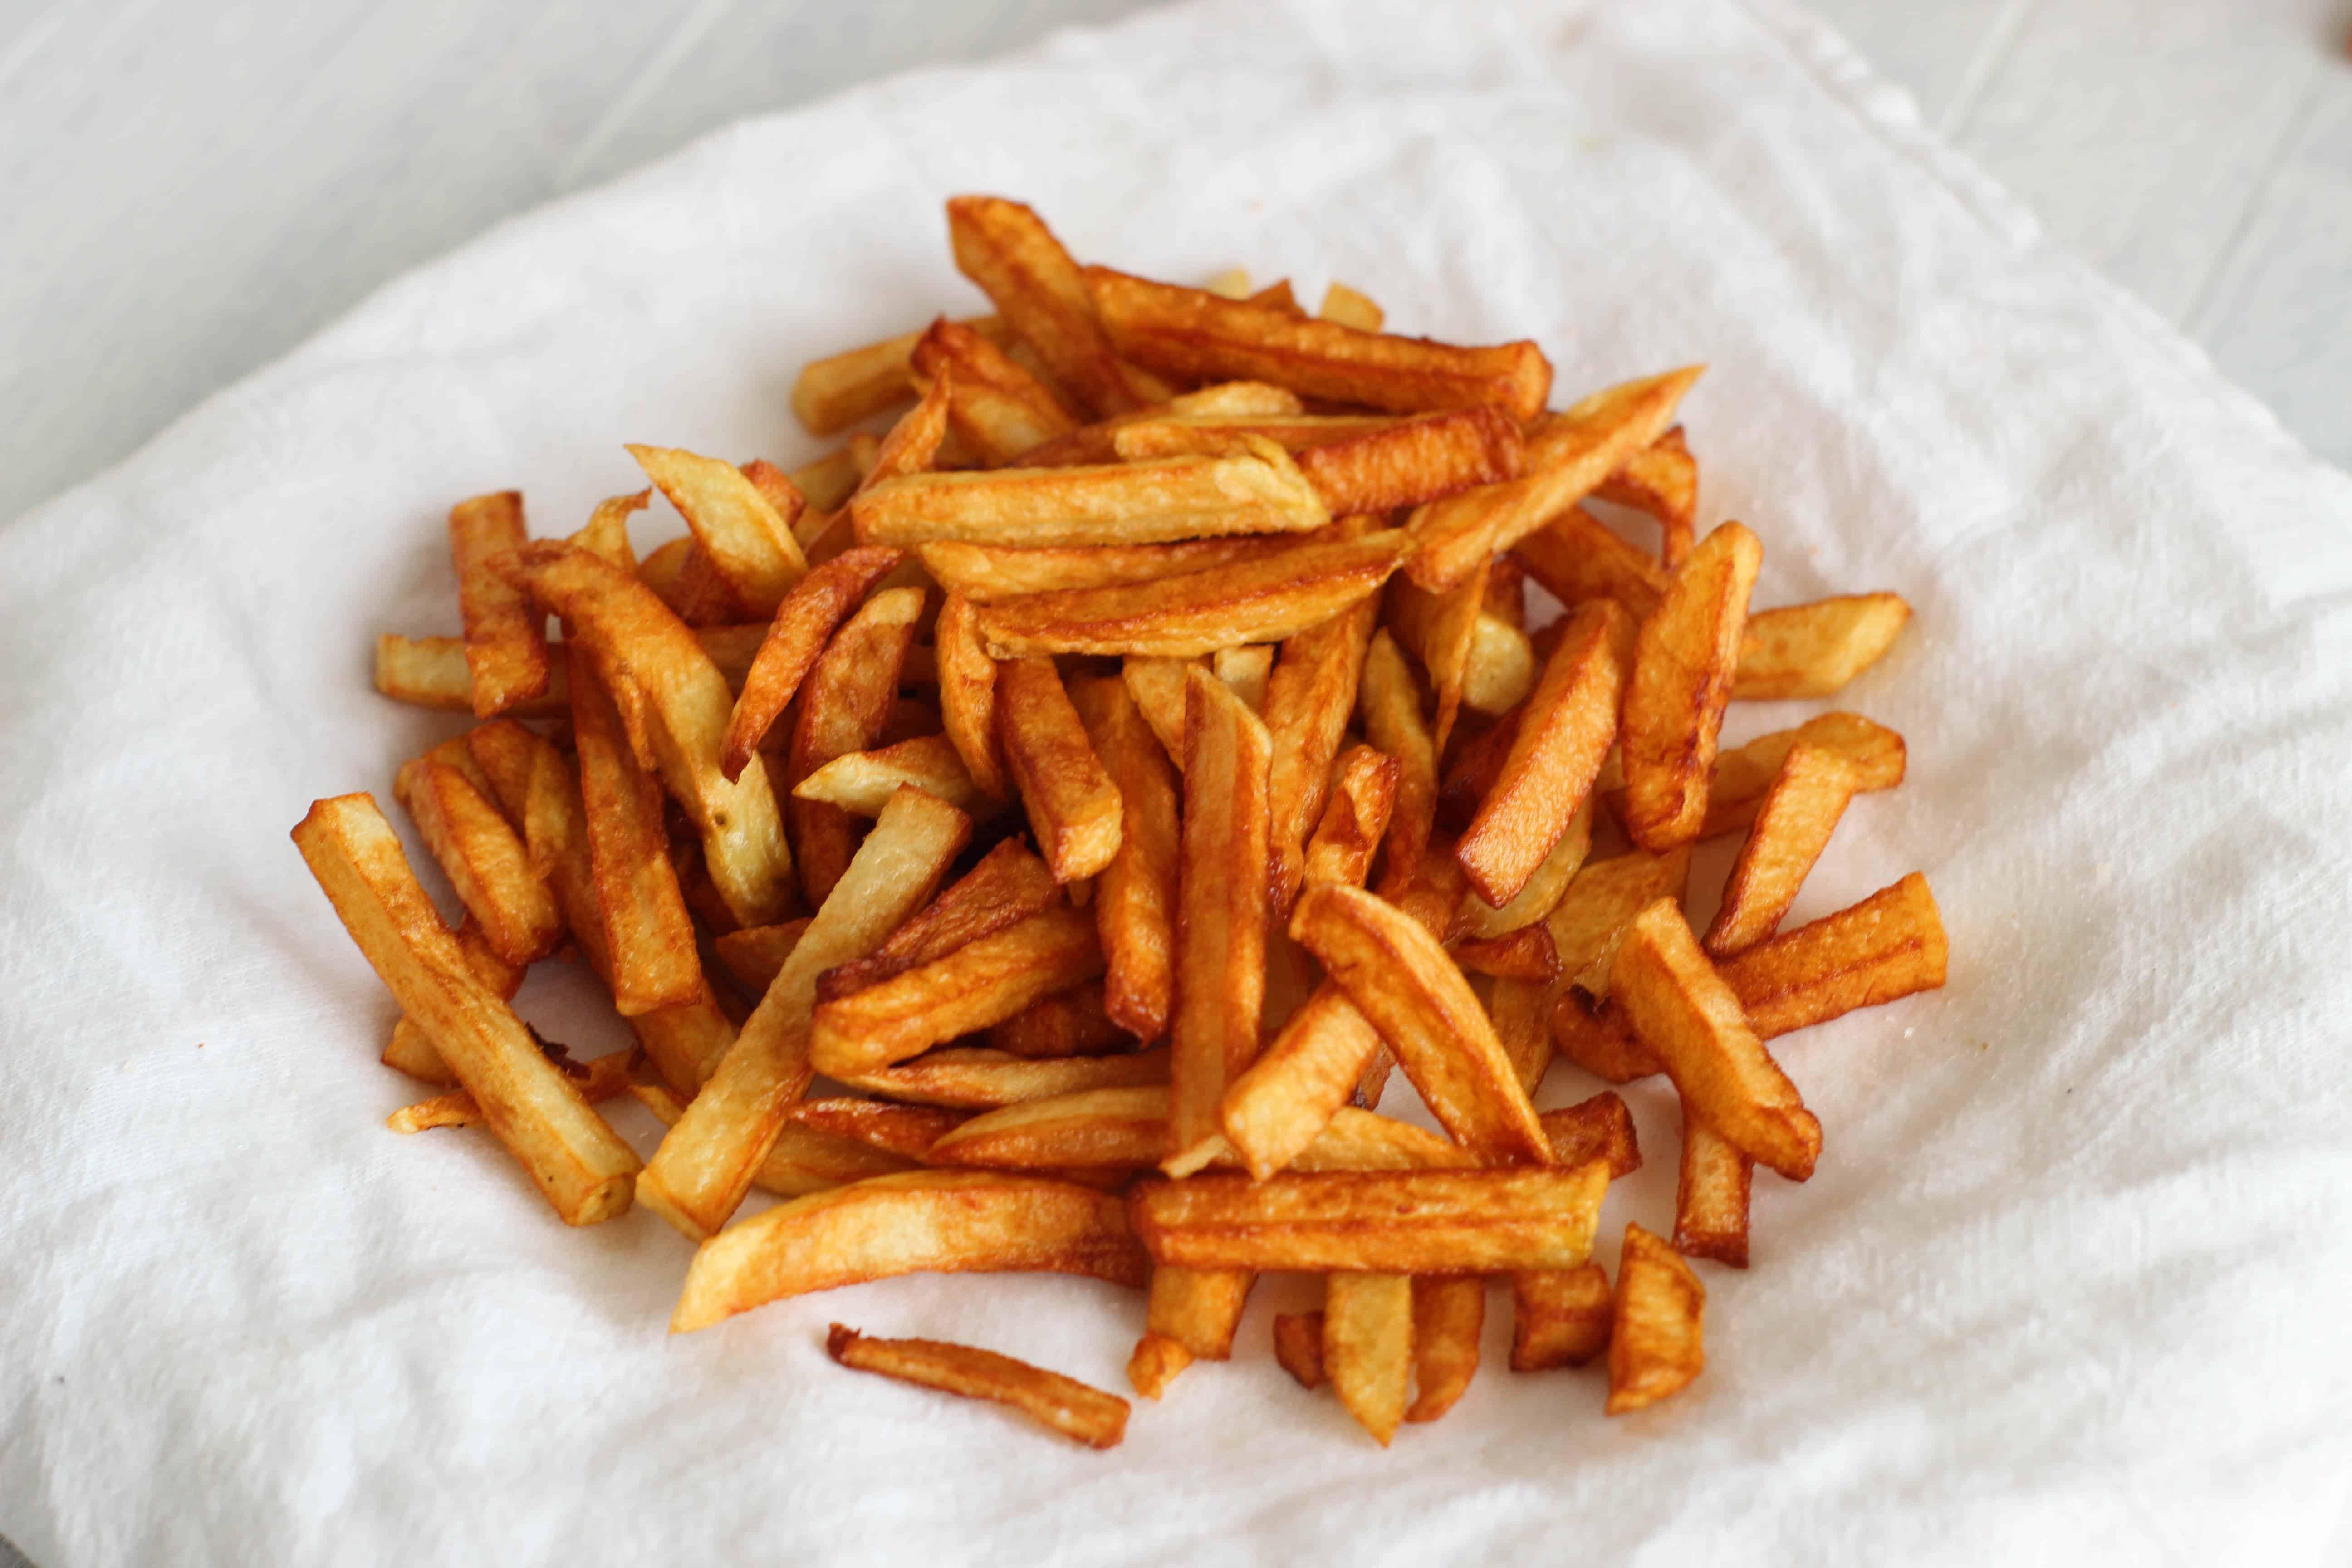 Beef tallow fries recipe